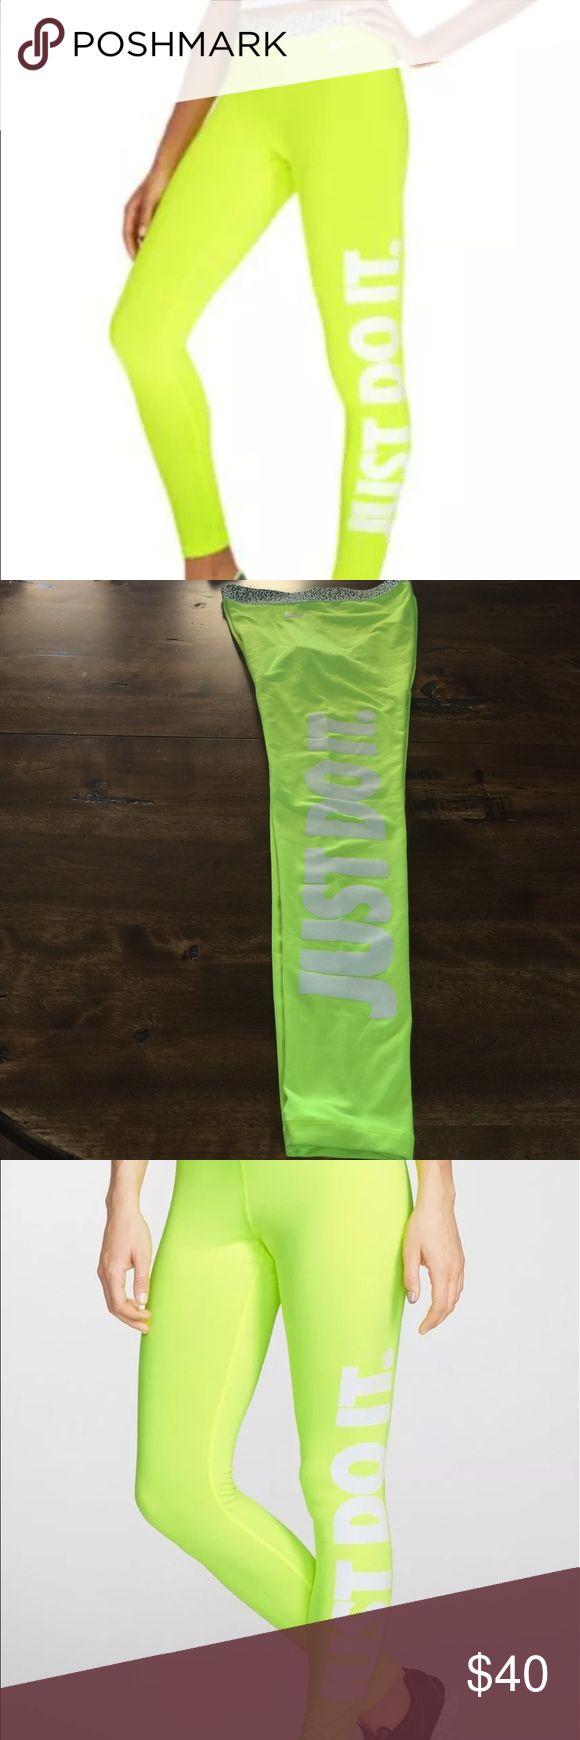 Nike Pro Hyperwarm Leggins Nike Pro Hyperwarm Leggins-wore once Nike Pants Leggings